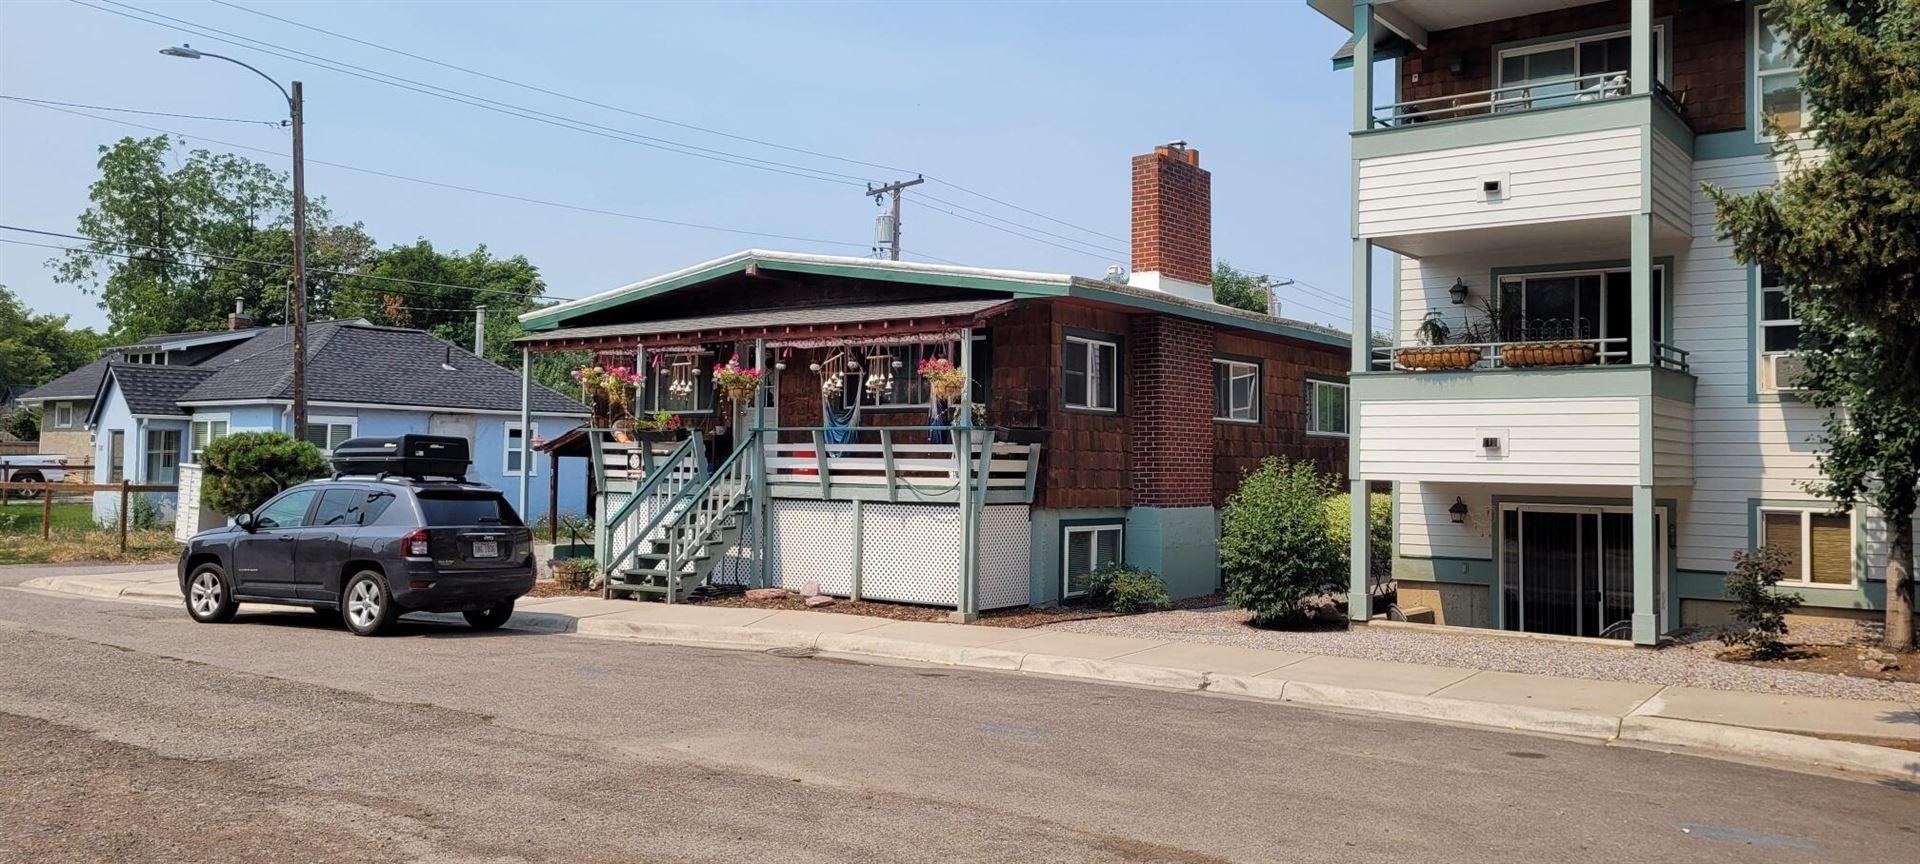 Photo of 1231 Kennett Avenue, Missoula, MT 59802 (MLS # 22111666)